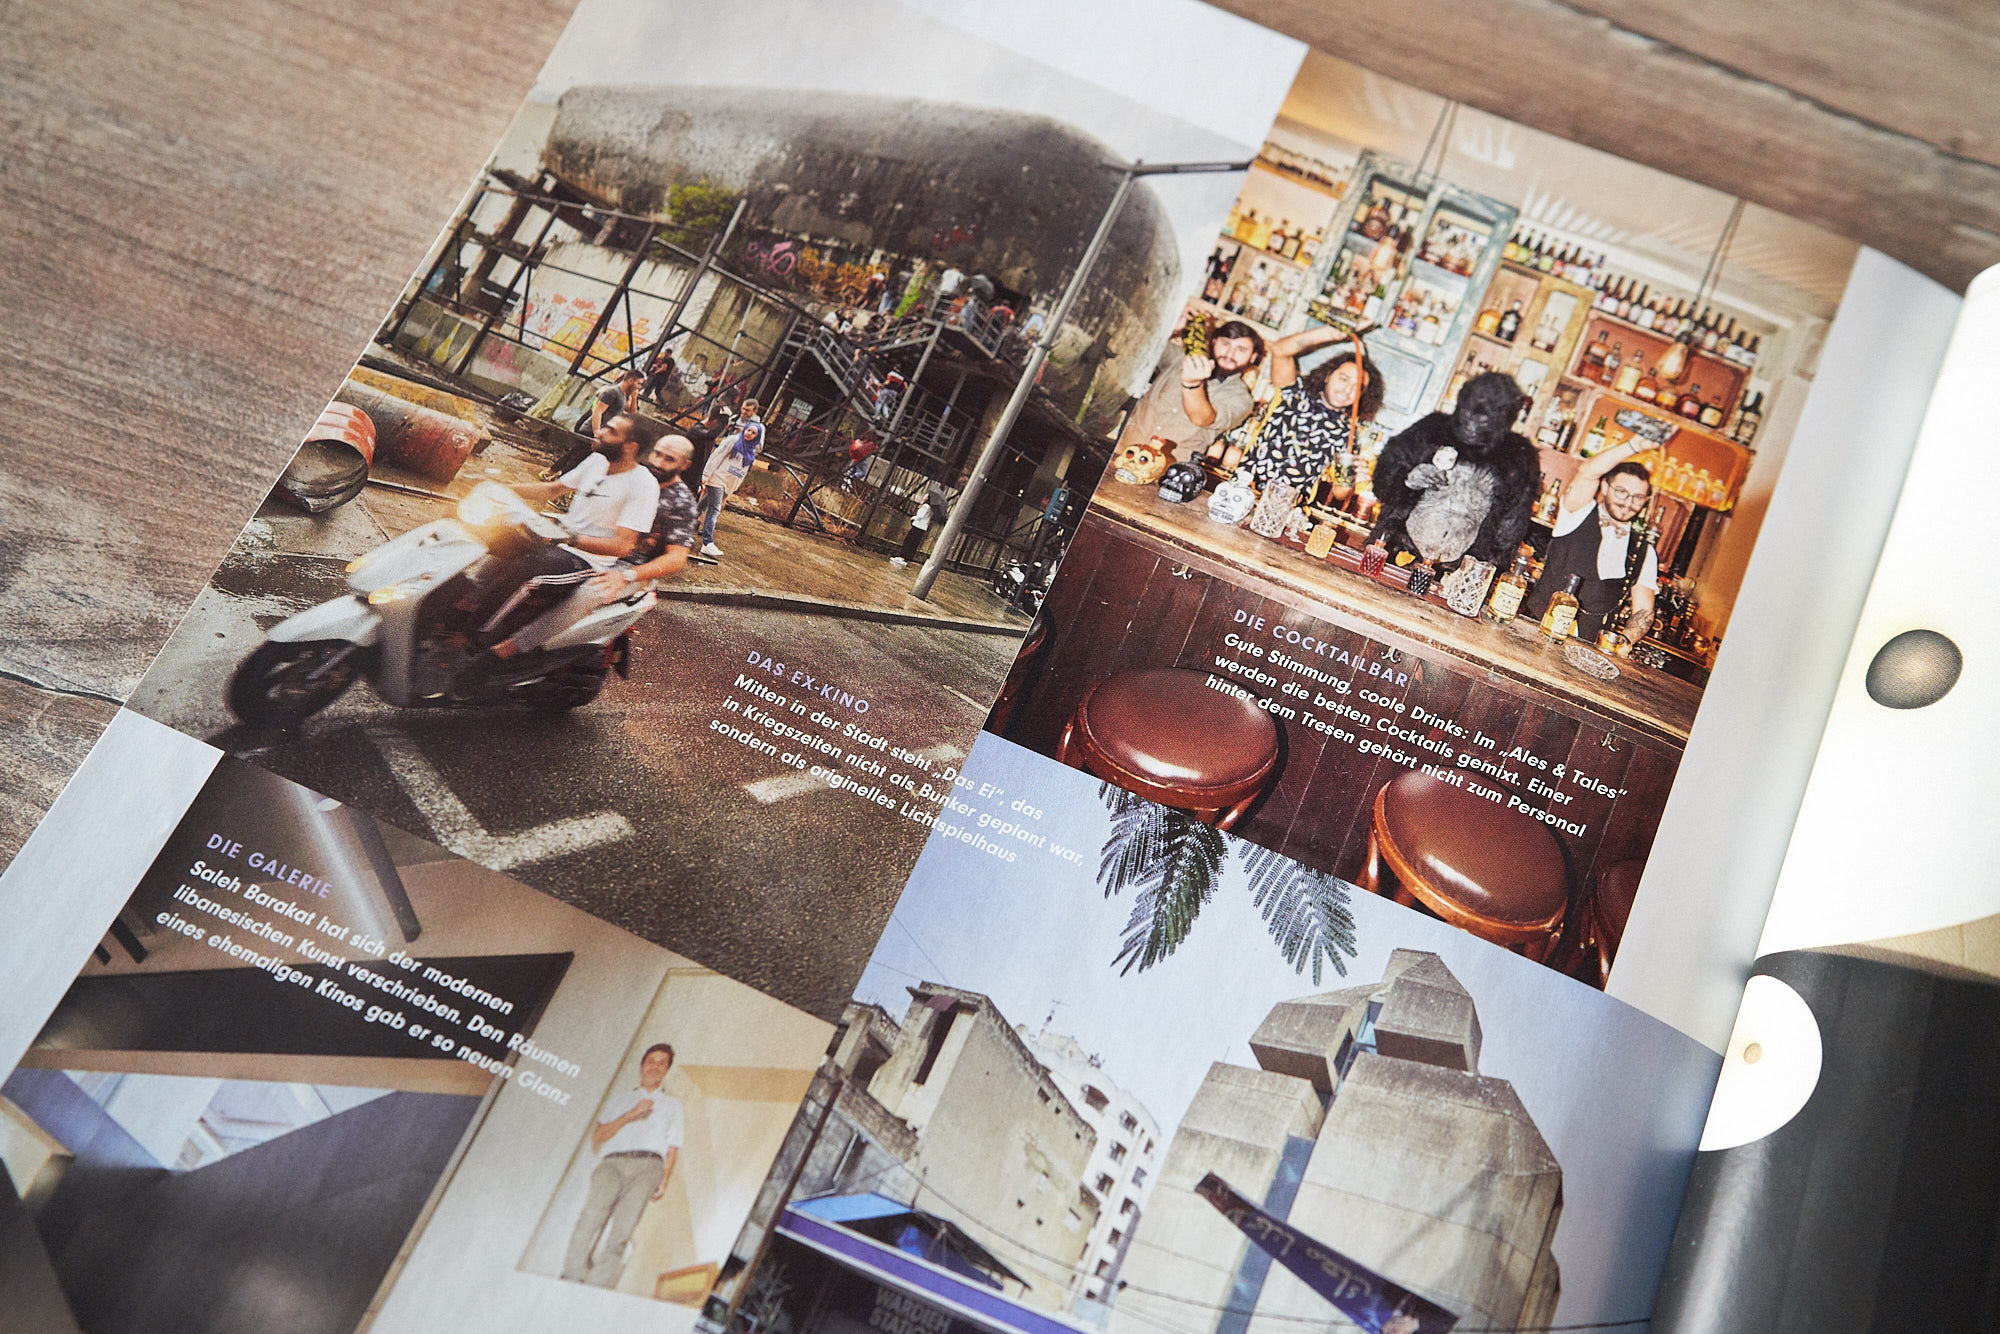 ROBERTINO NIKOLIC - BEIRUT | CLIENT - A&W MAGAZIN | REPRESENTED BY BANRAP